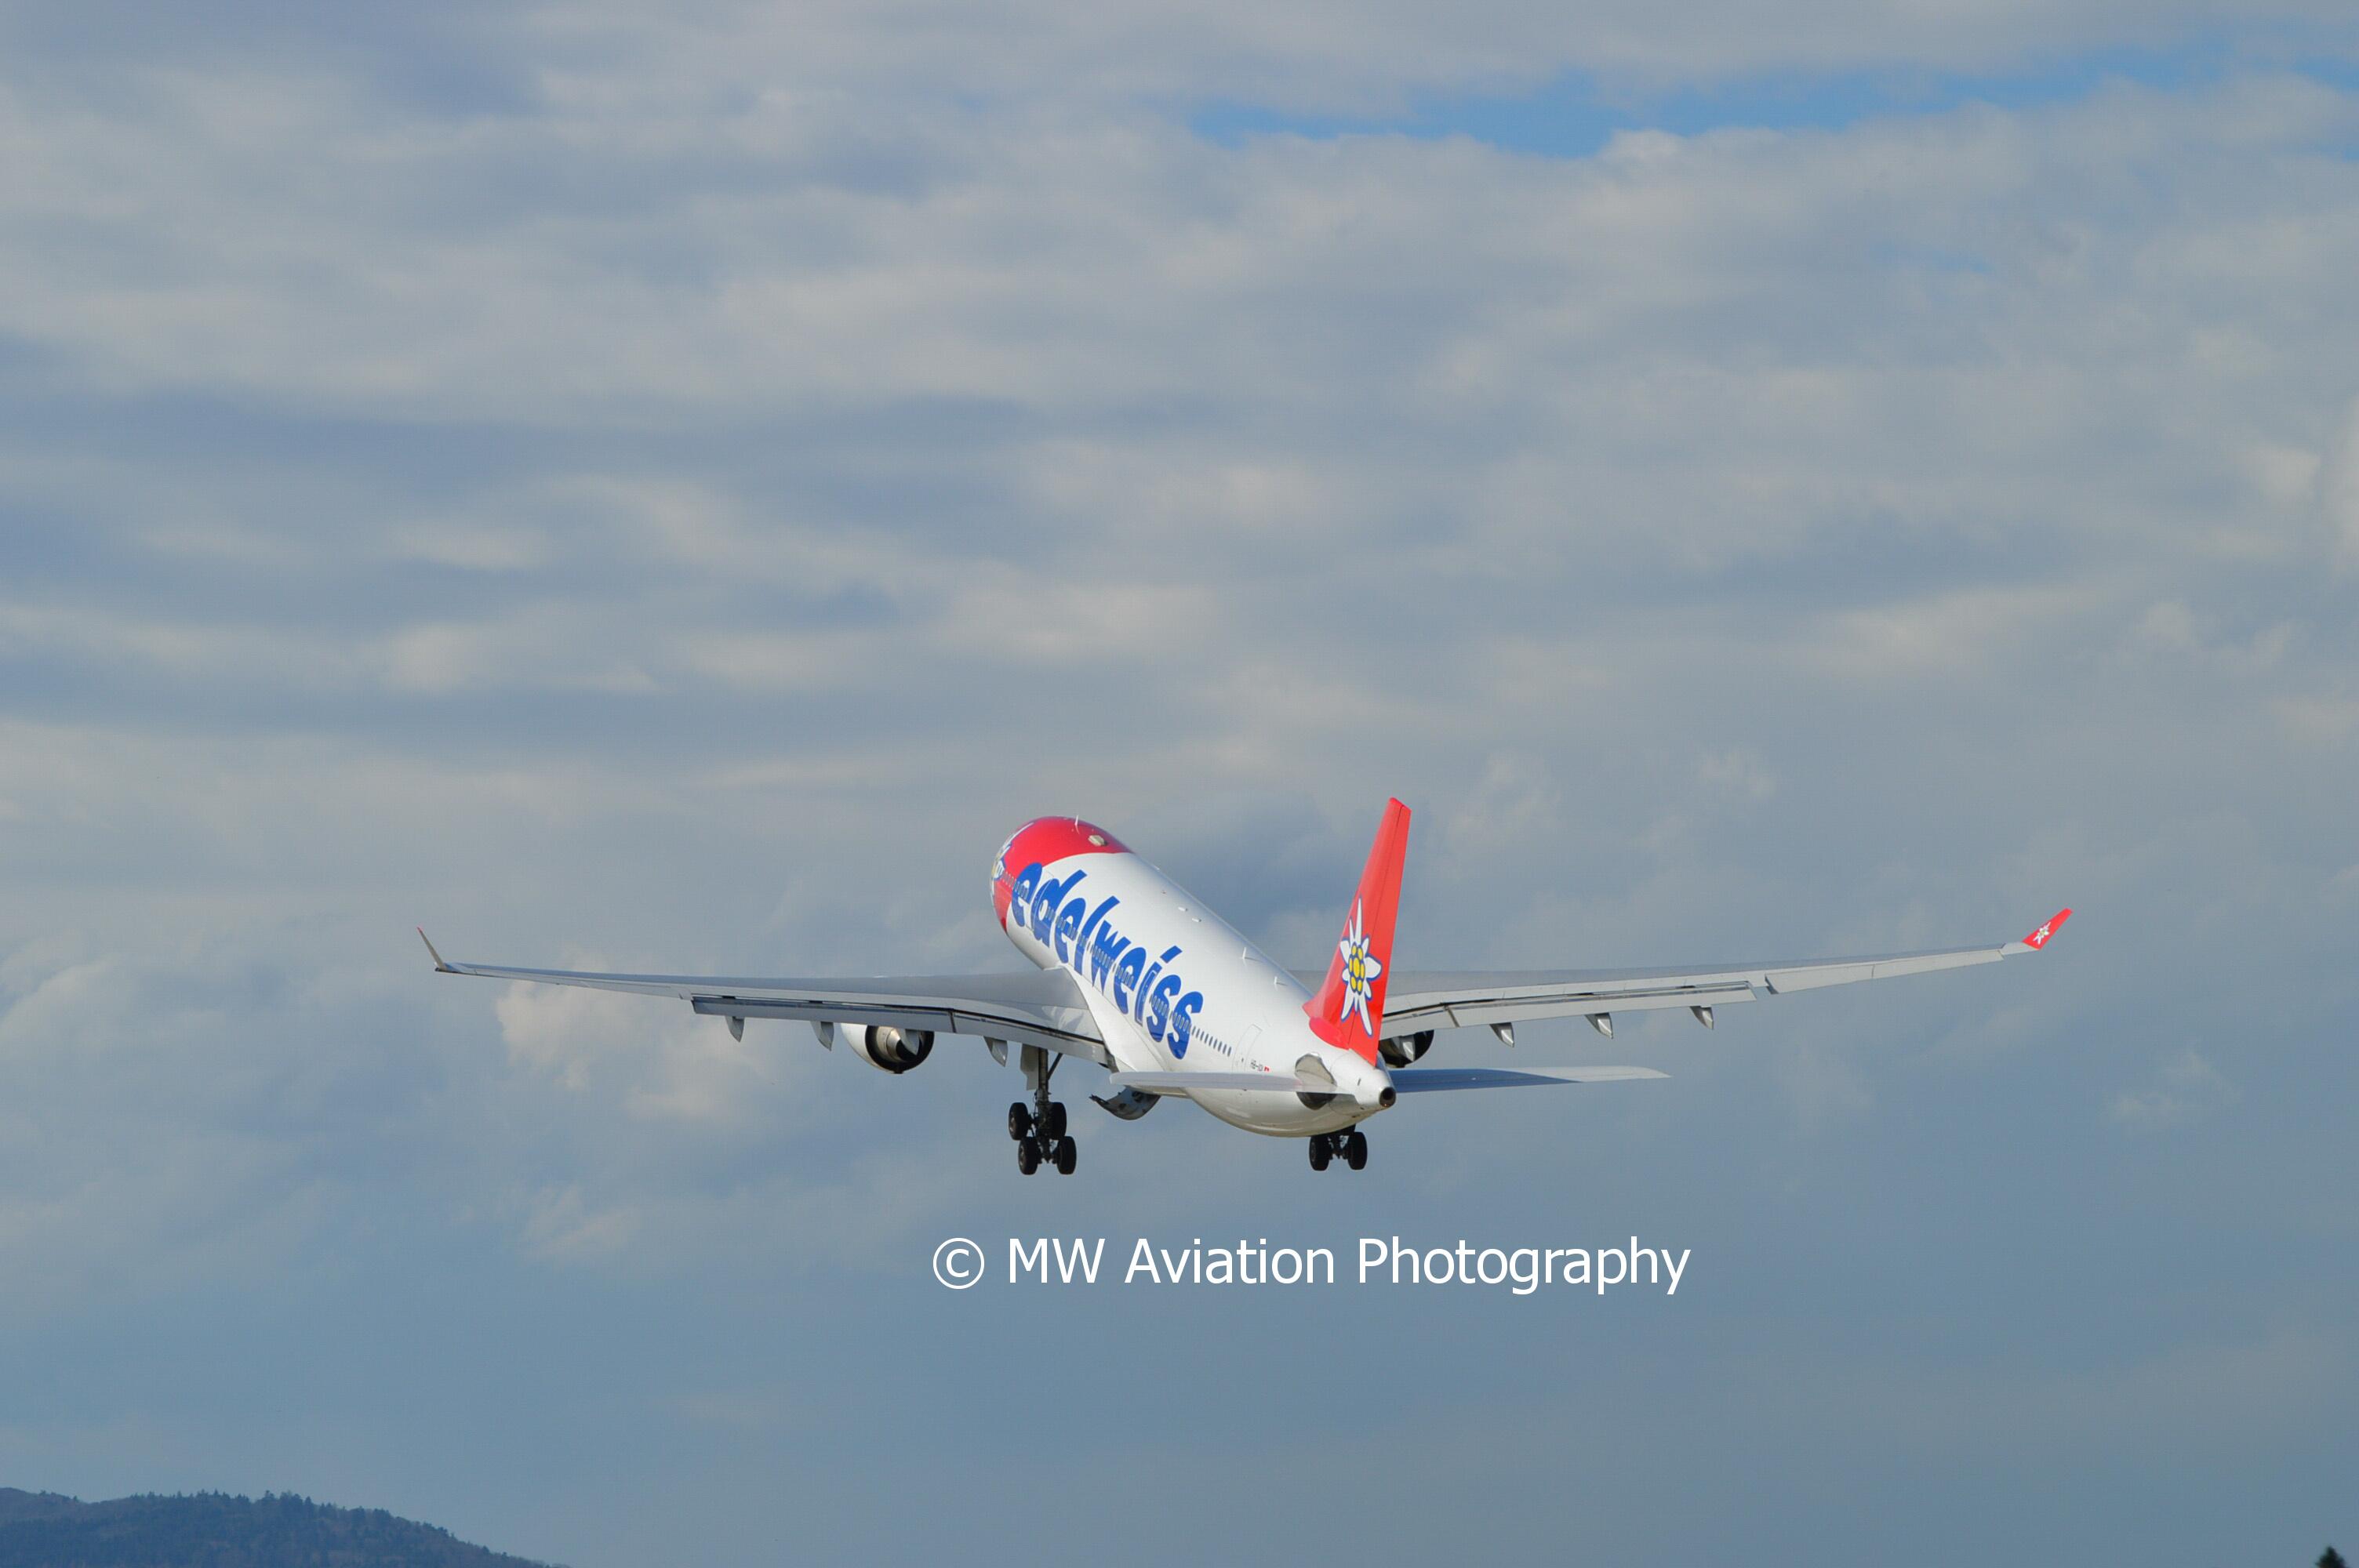 Edelwiss A330